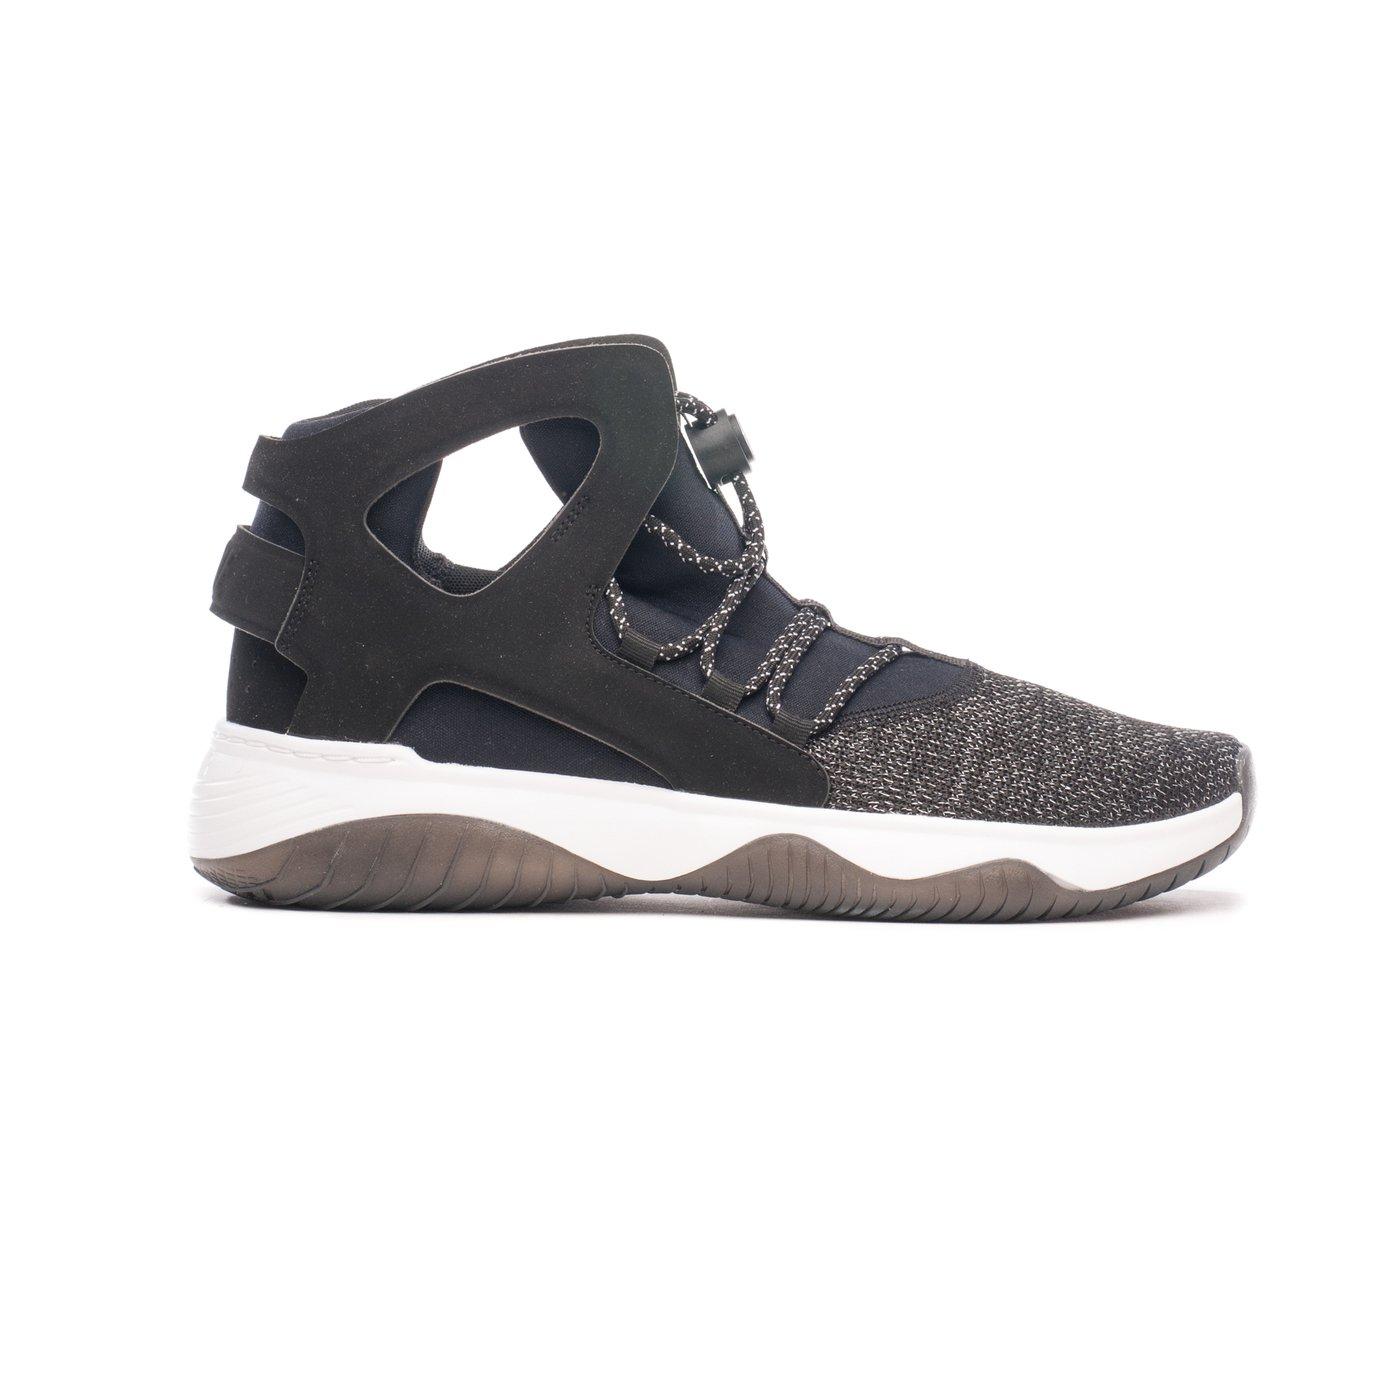 Кросівки чоловічі Nike AIR FLIGHT HUARACHE RUN ULTRA